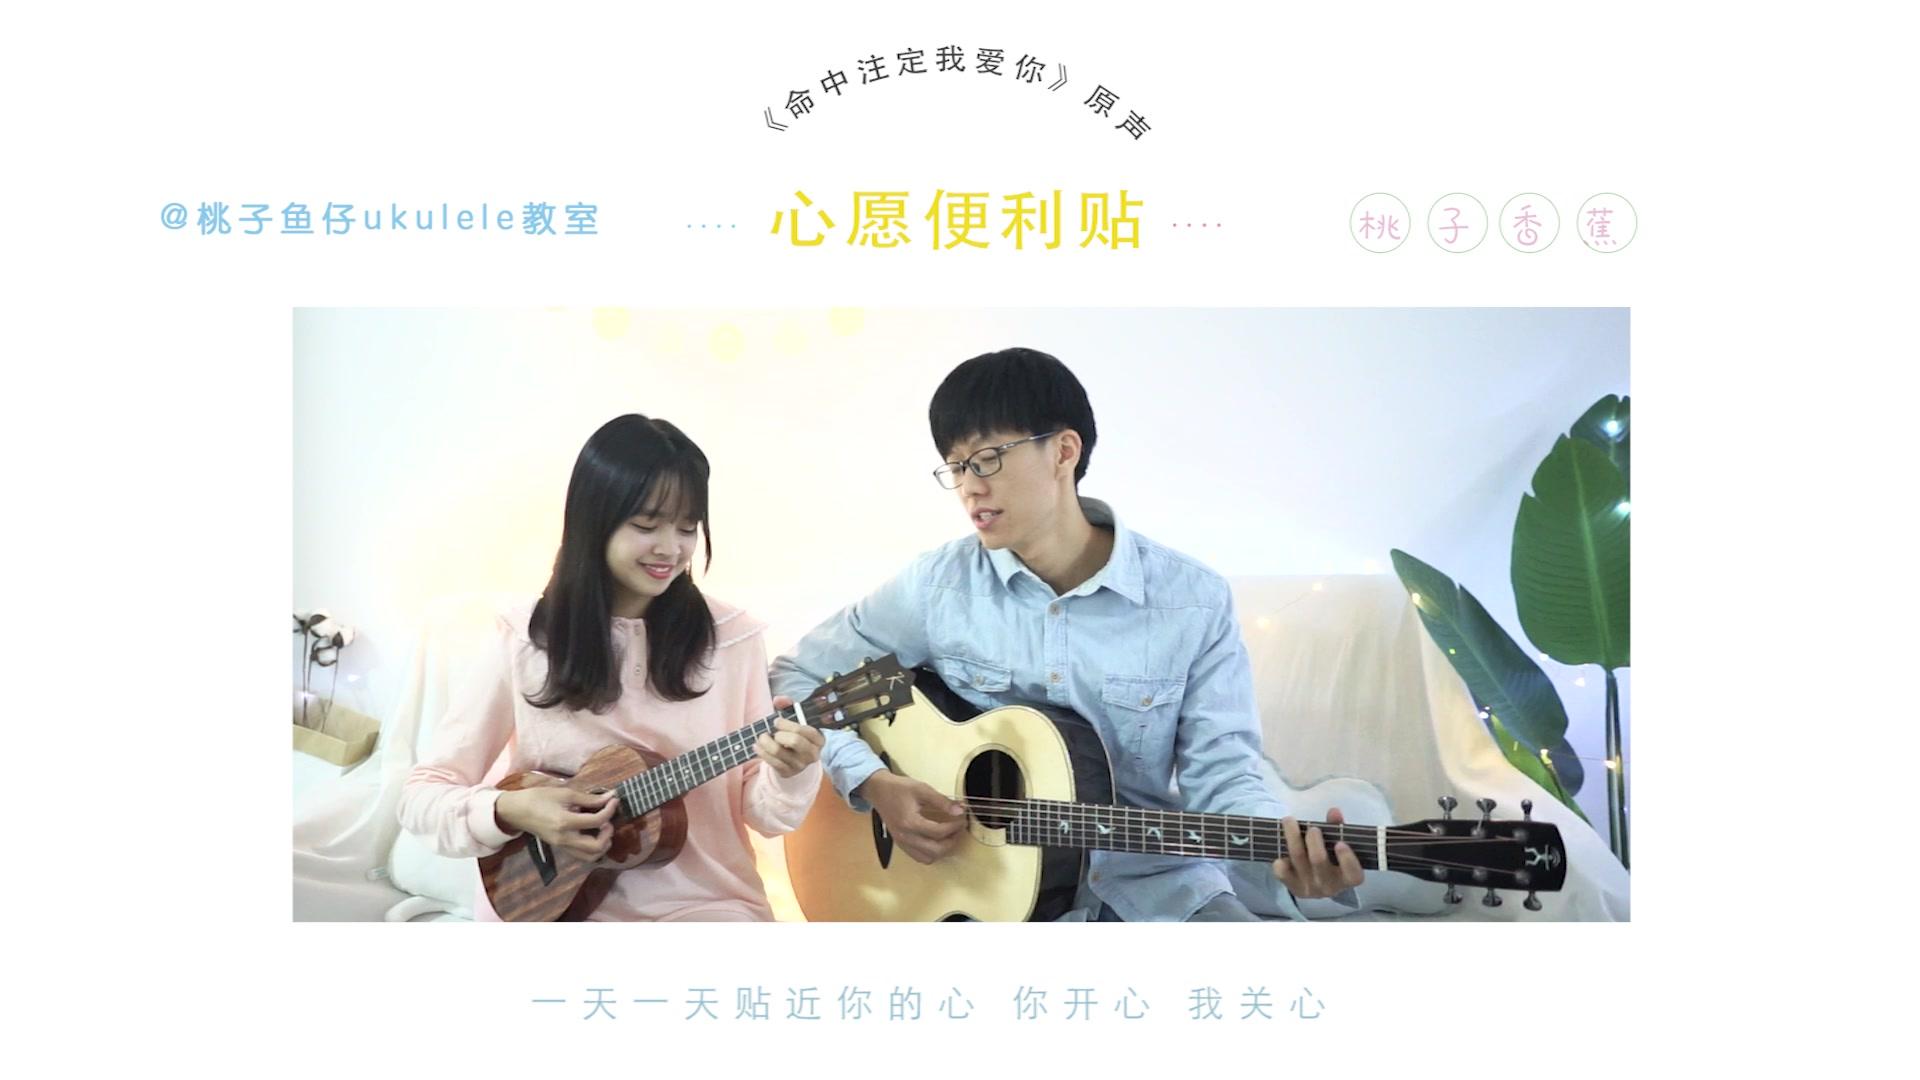 《命中注定我愛你》主題曲丨「心愿便利貼」 尤克里里吉他彈唱cover【桃子魚仔ukulele教室】_嗶哩嗶哩 (゜-゜)つロ 干杯~-bilibili